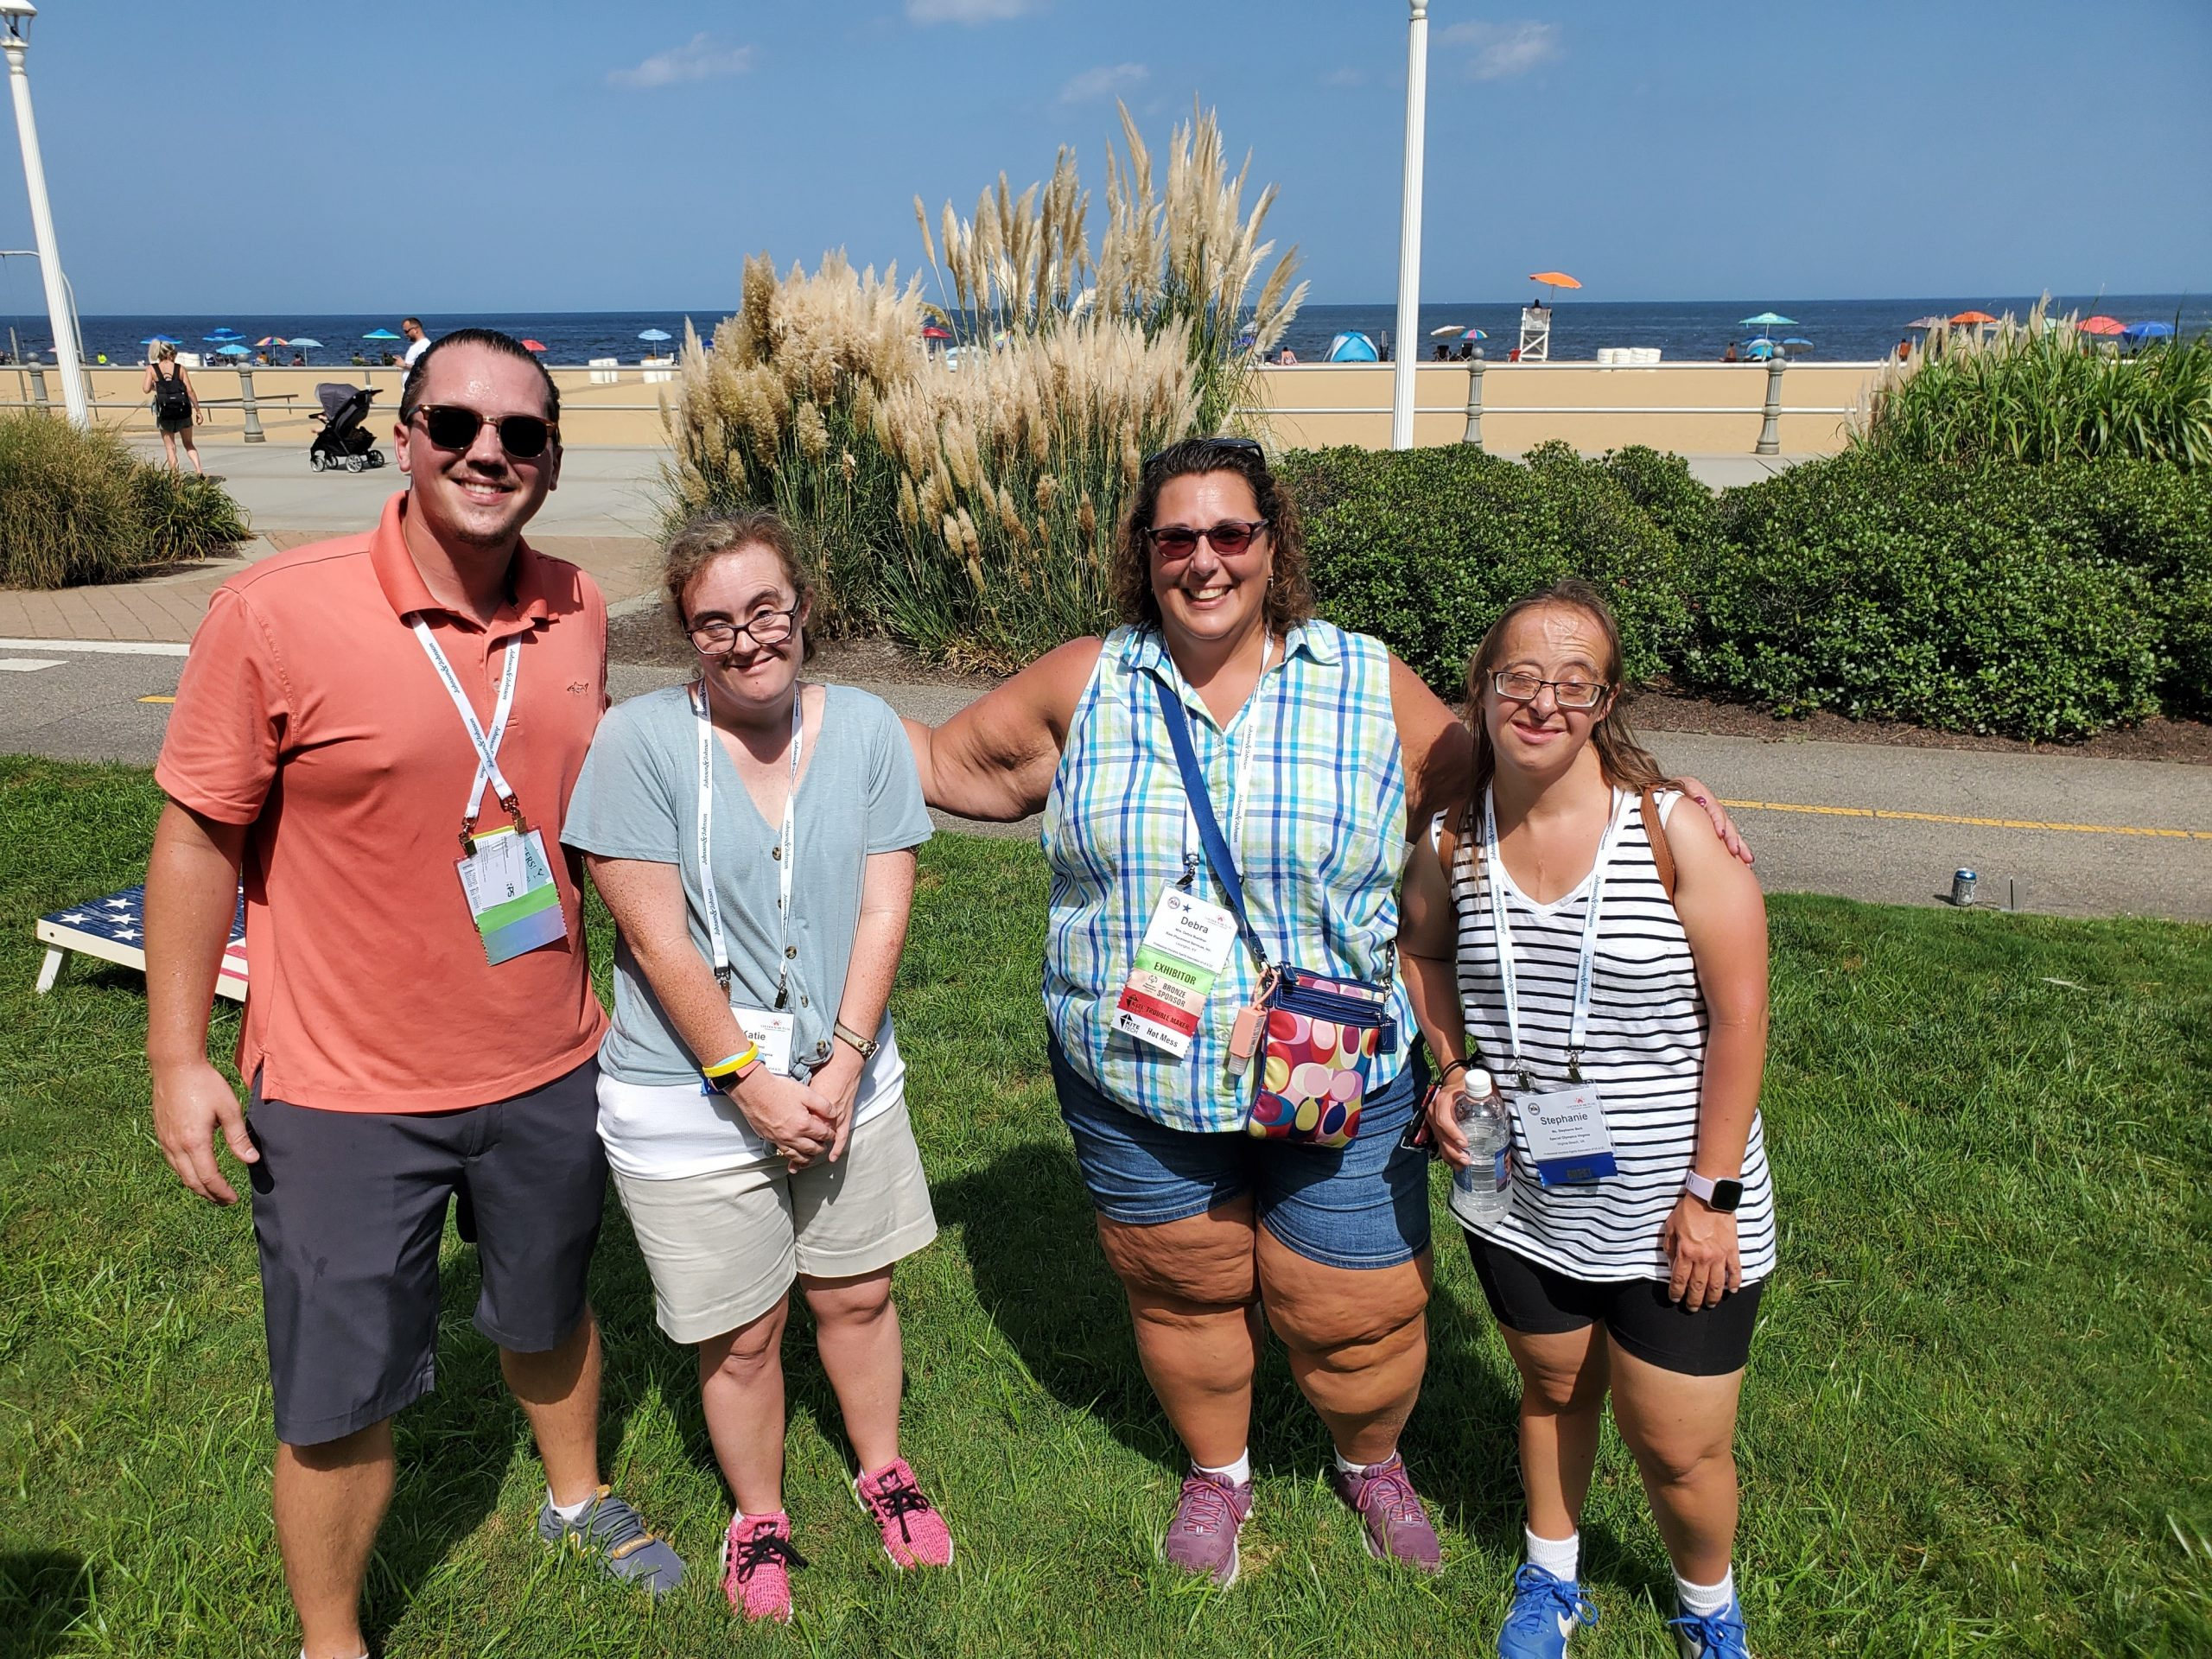 Mitchell Blaser, Katie Blind, Debra Buettner, and Stephanie Berk enjoyed the 2021 Cornhole Tournament.